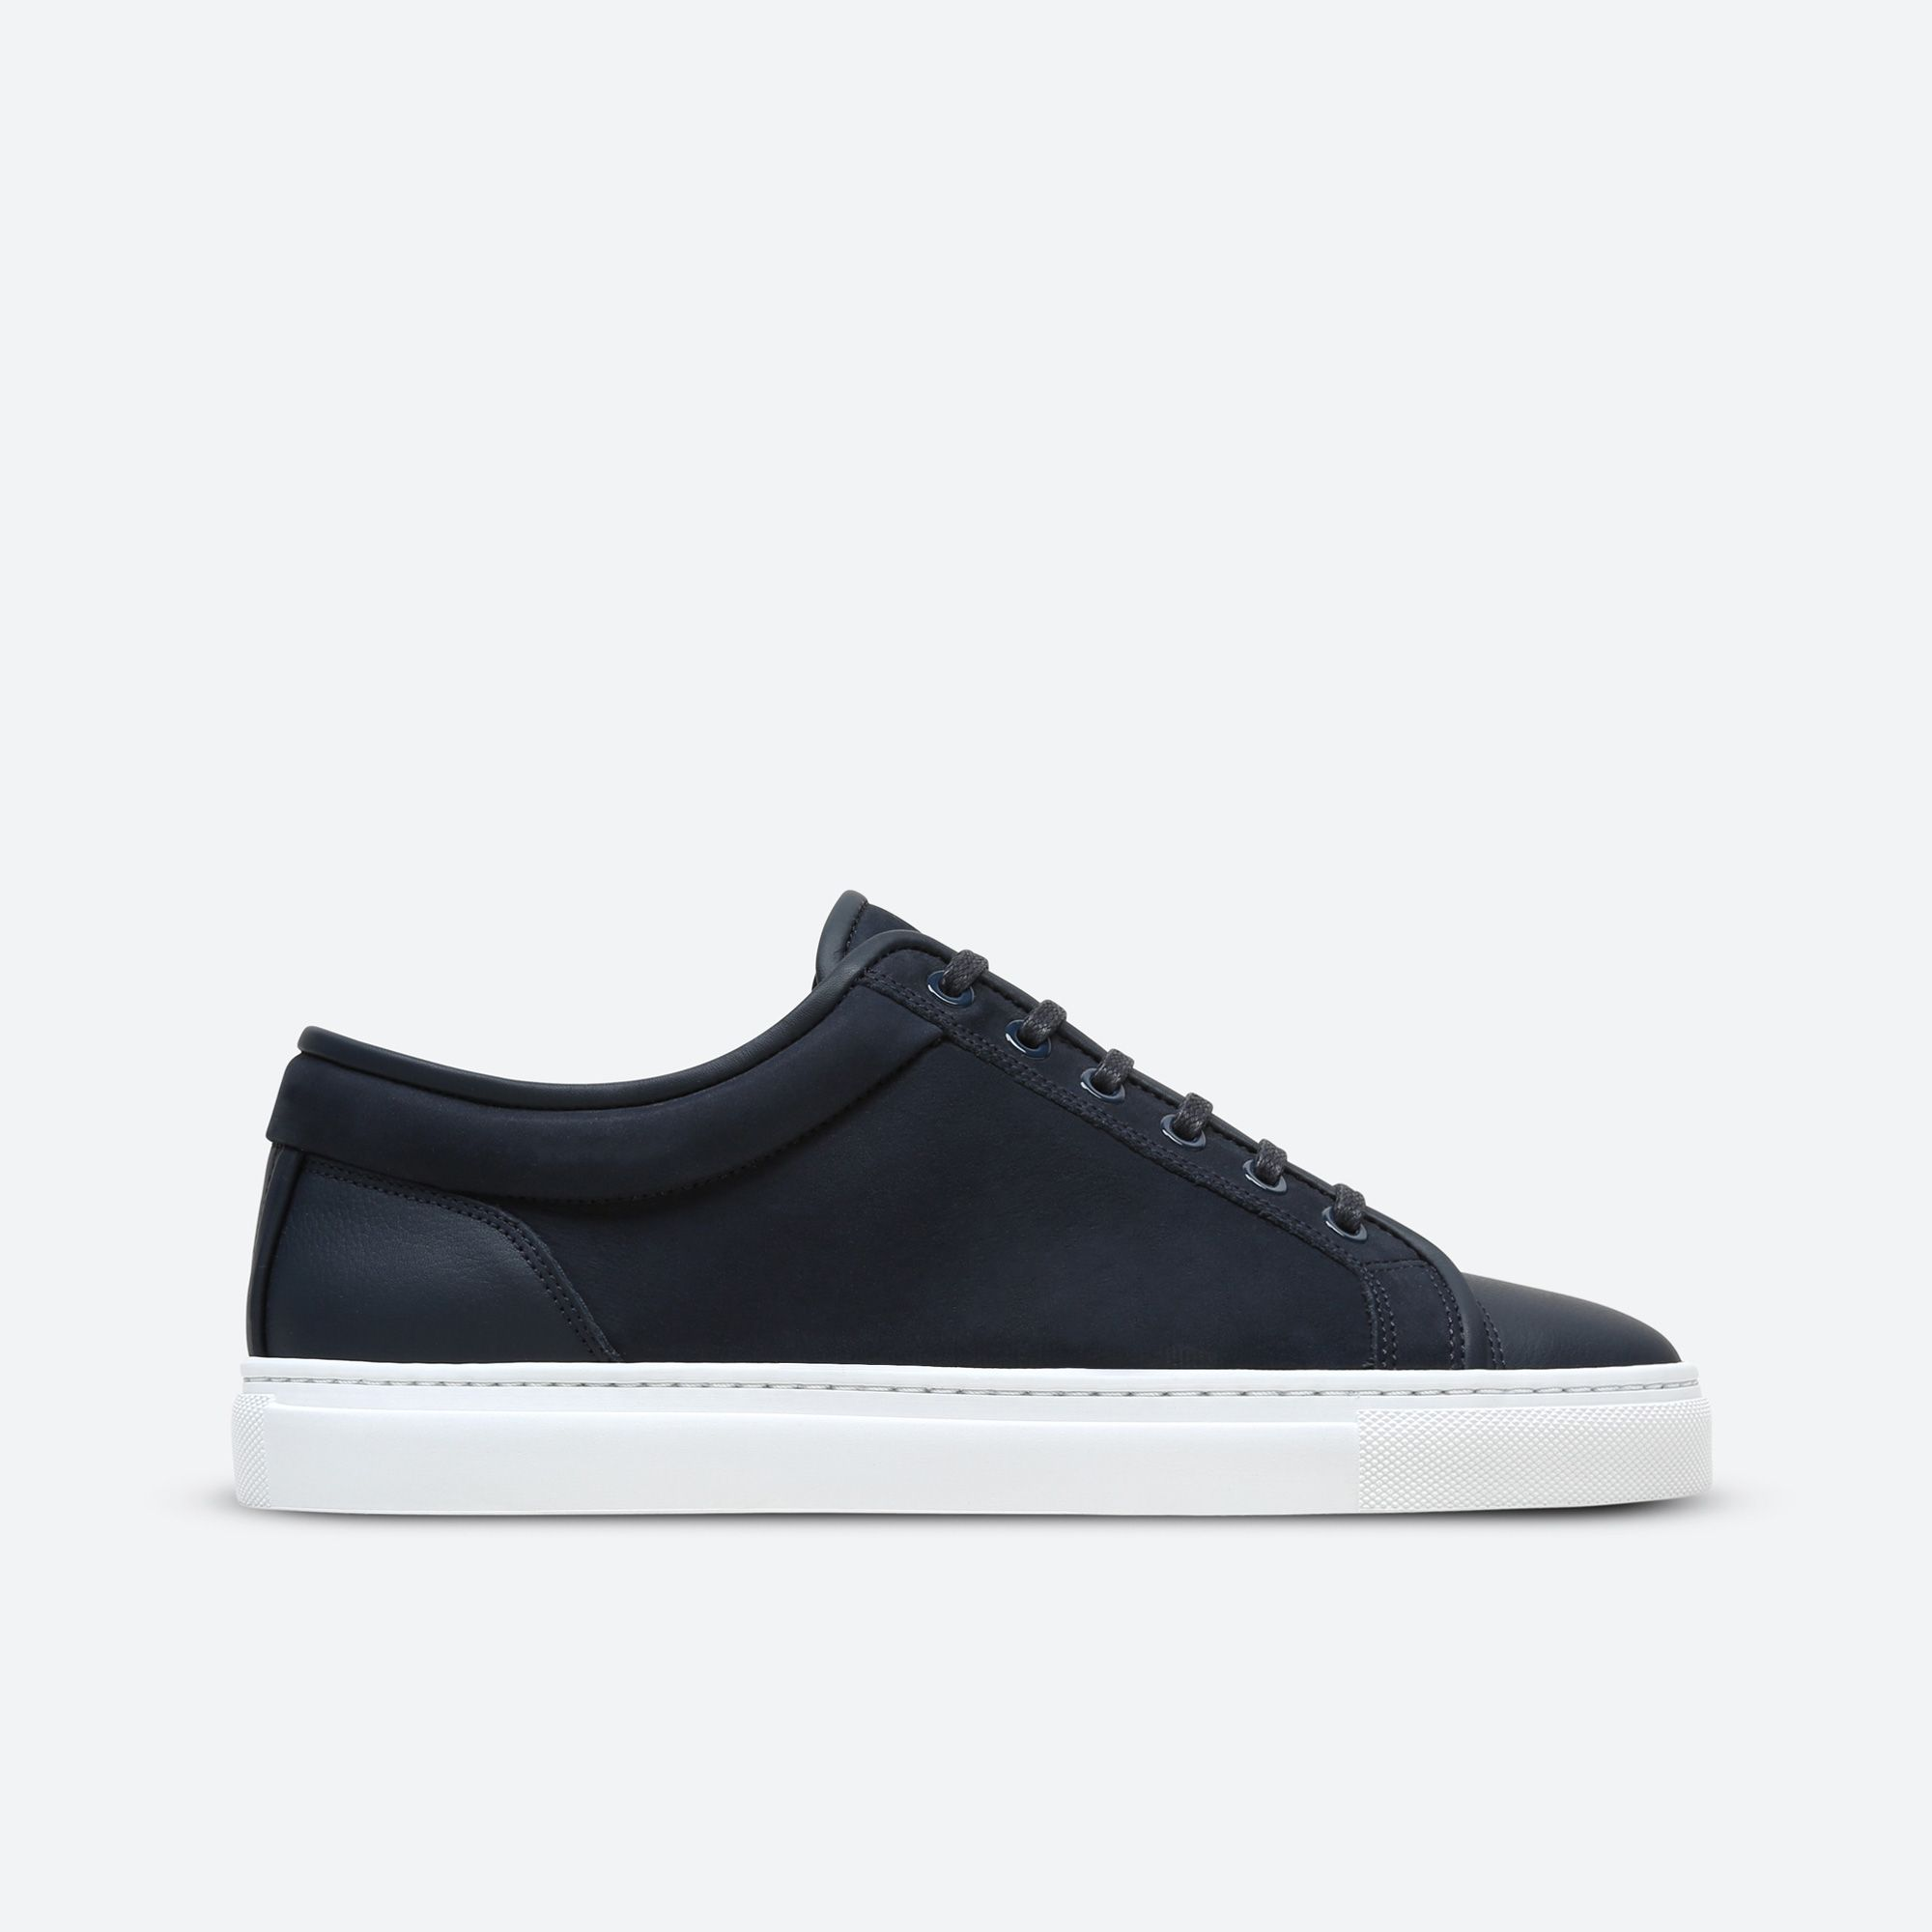 ETQ Amsterdam creates a modern minimalist perspective on footwear.